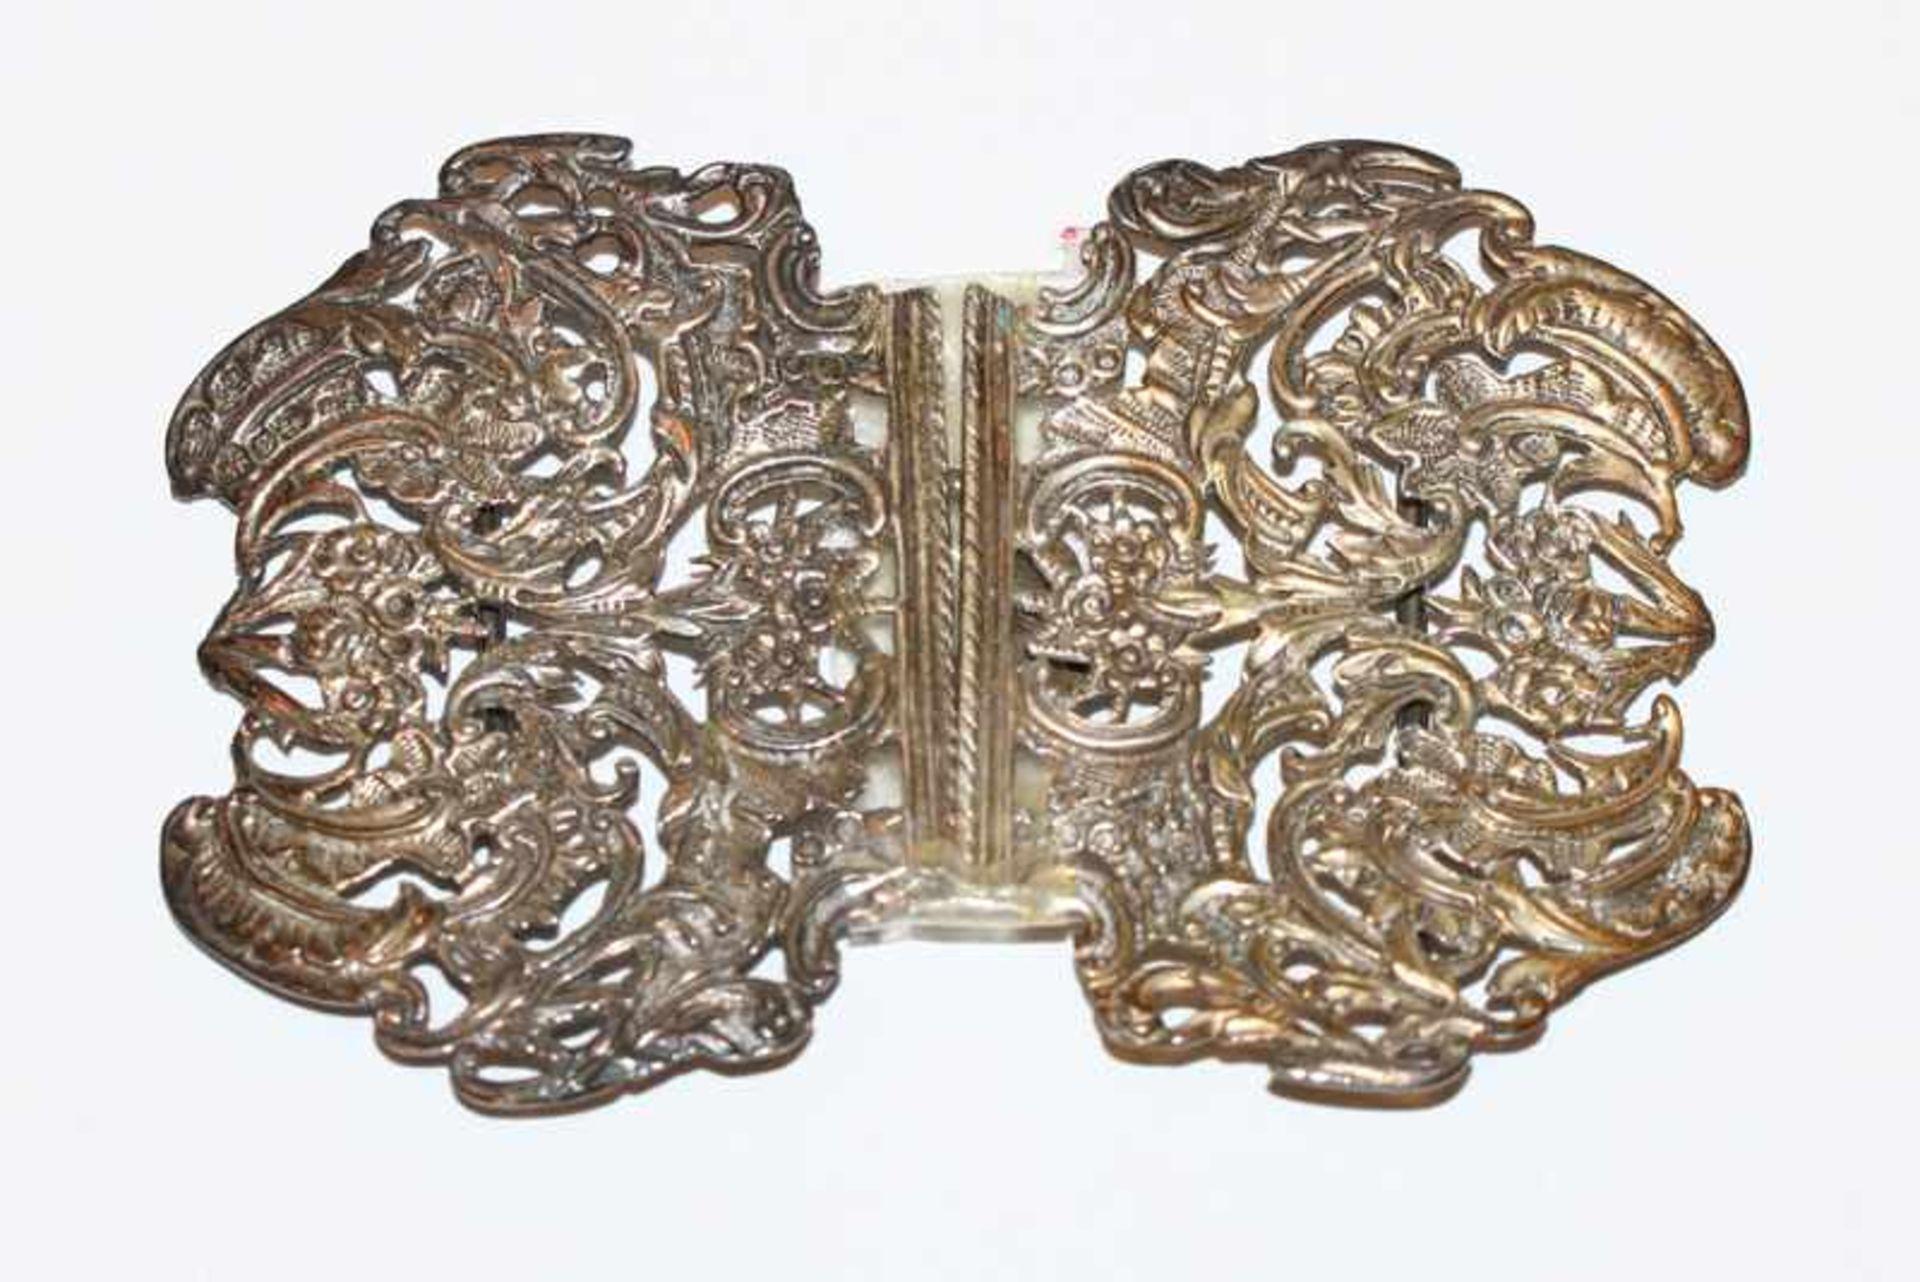 Los 64 - Schließe, Sterlingsilber, Birmingham, H 7 cm, B 10,5 cm